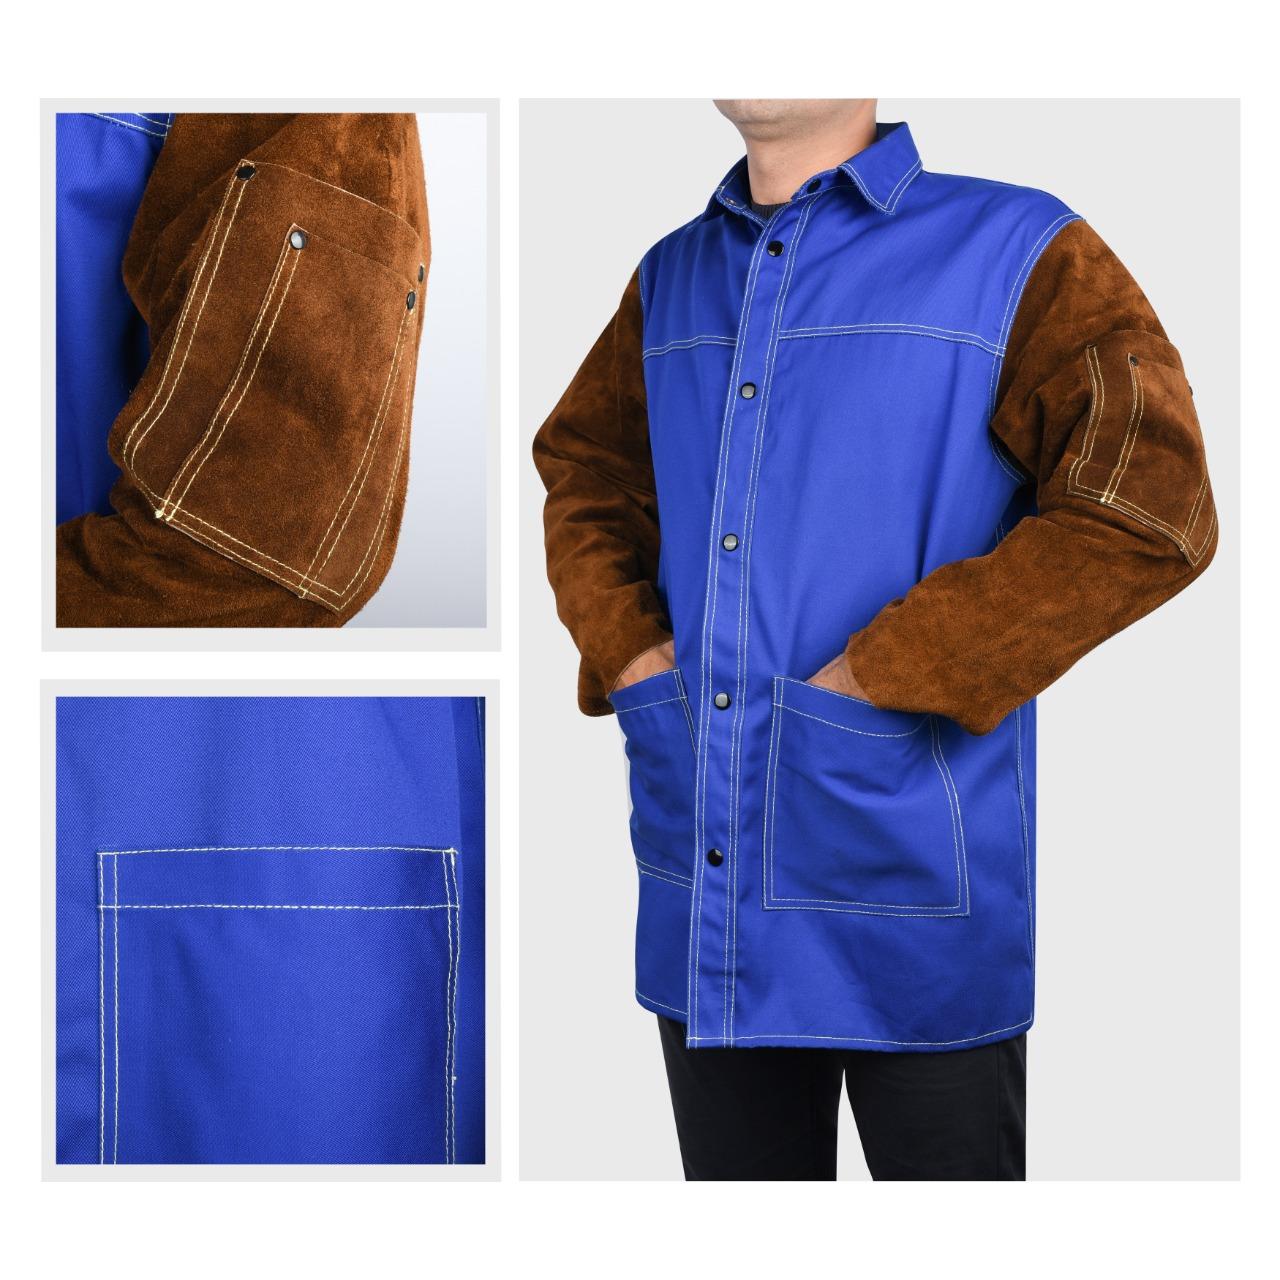 kevlar stitched jacket